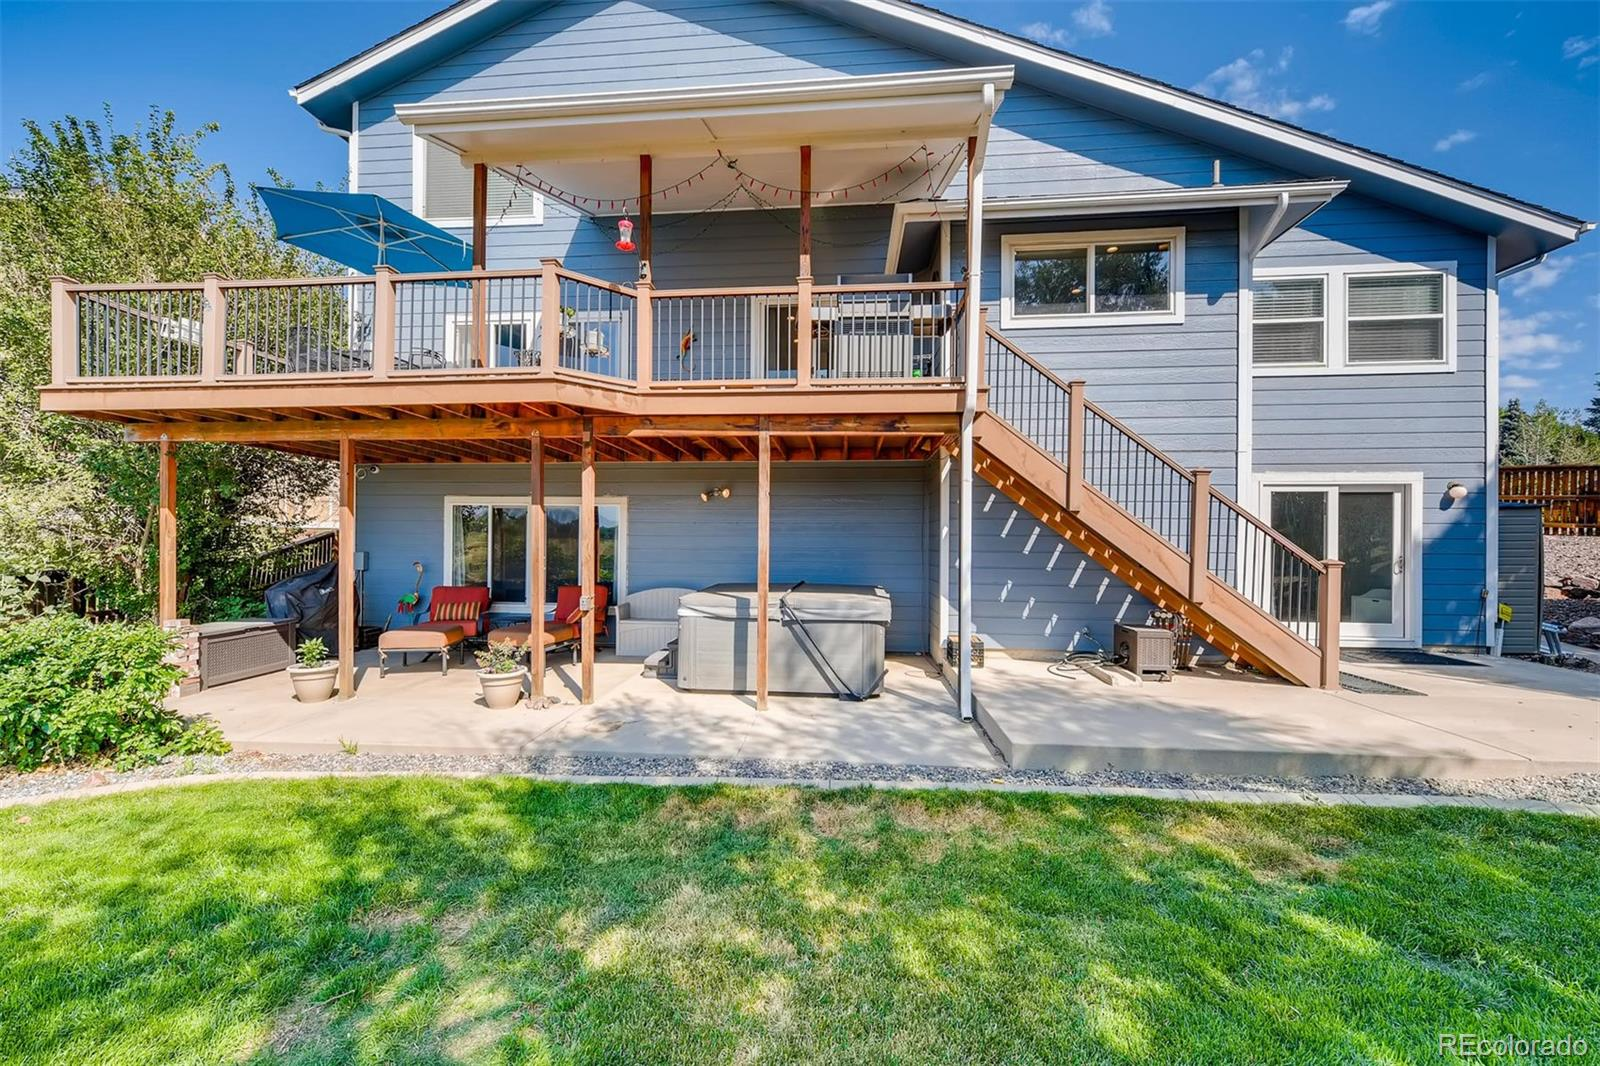 MLS# 2832026 - 33 - 1594 Arrowhead Road, Highlands Ranch, CO 80126